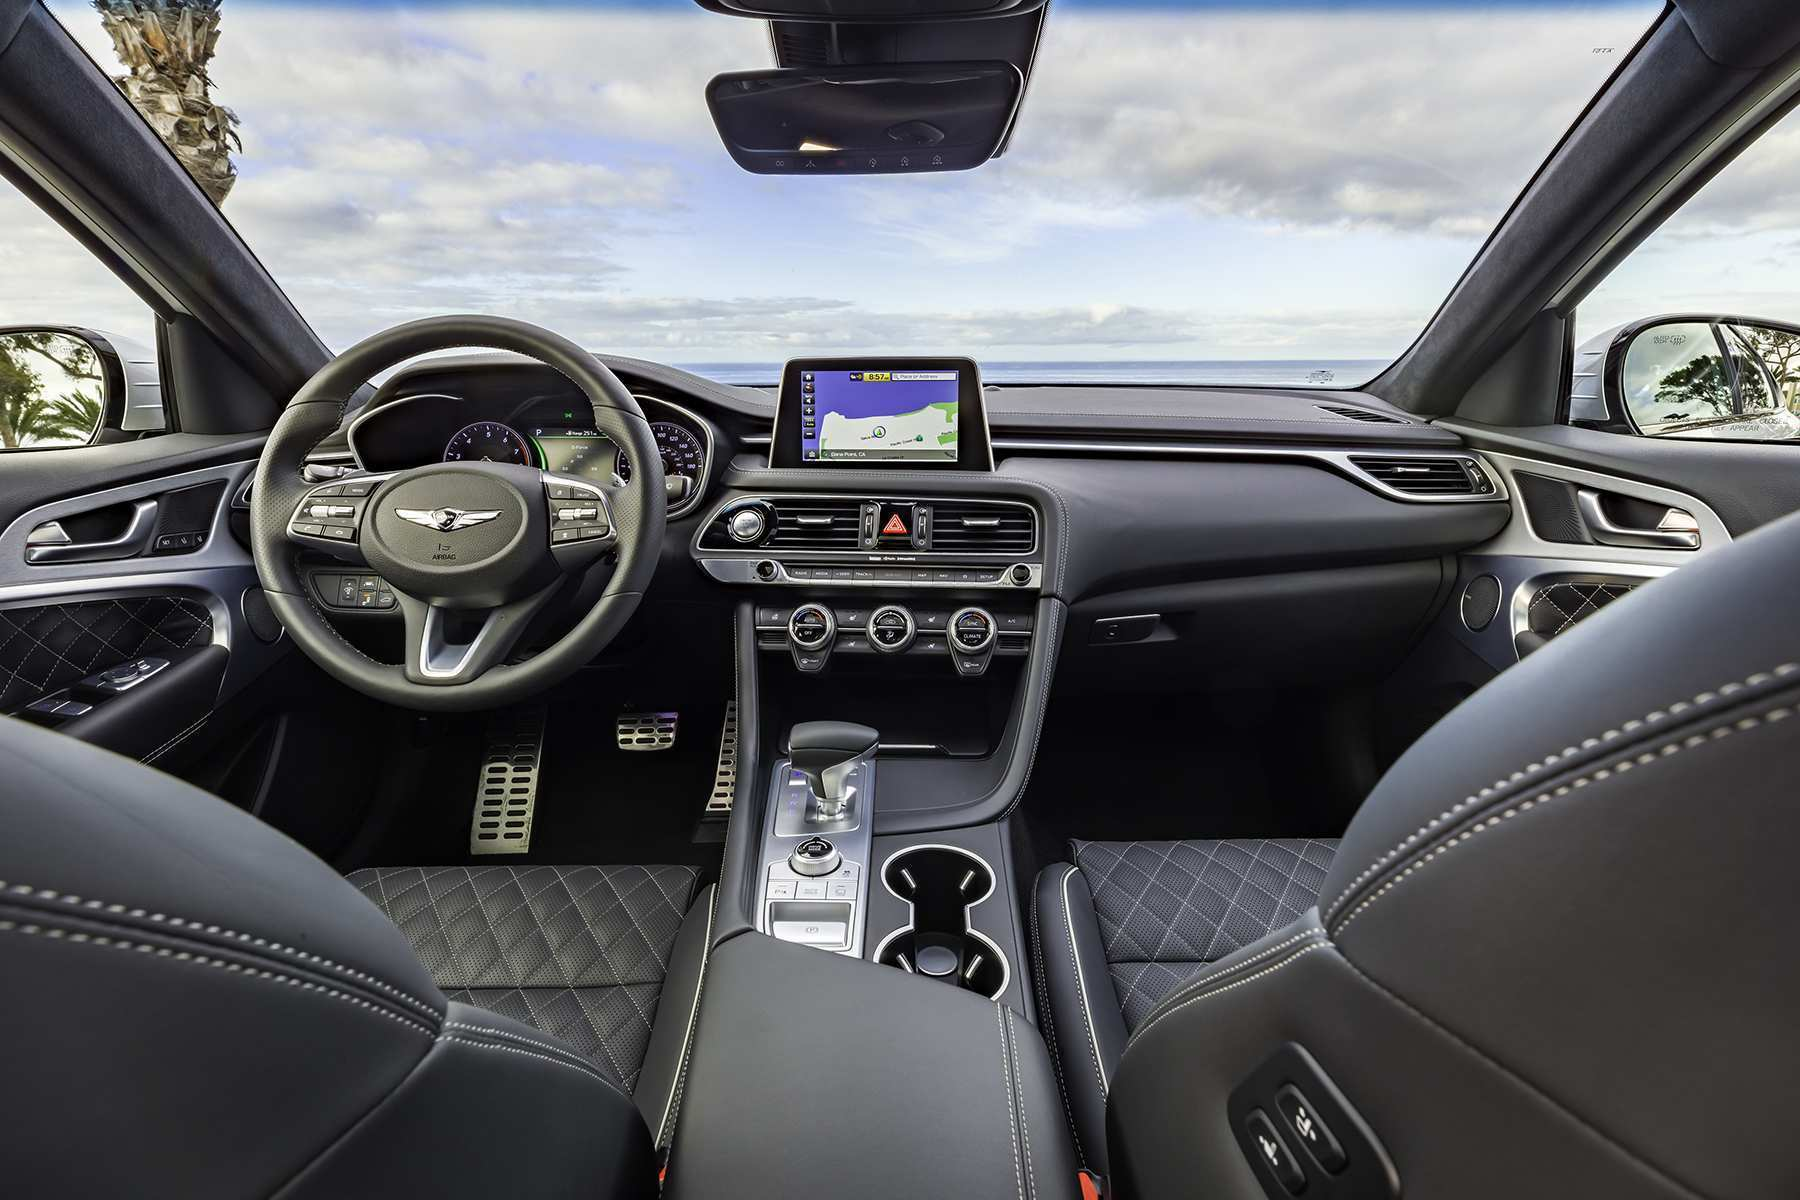 65 New 2019 Genesis G70 Specs Reviews with 2019 Genesis G70 Specs